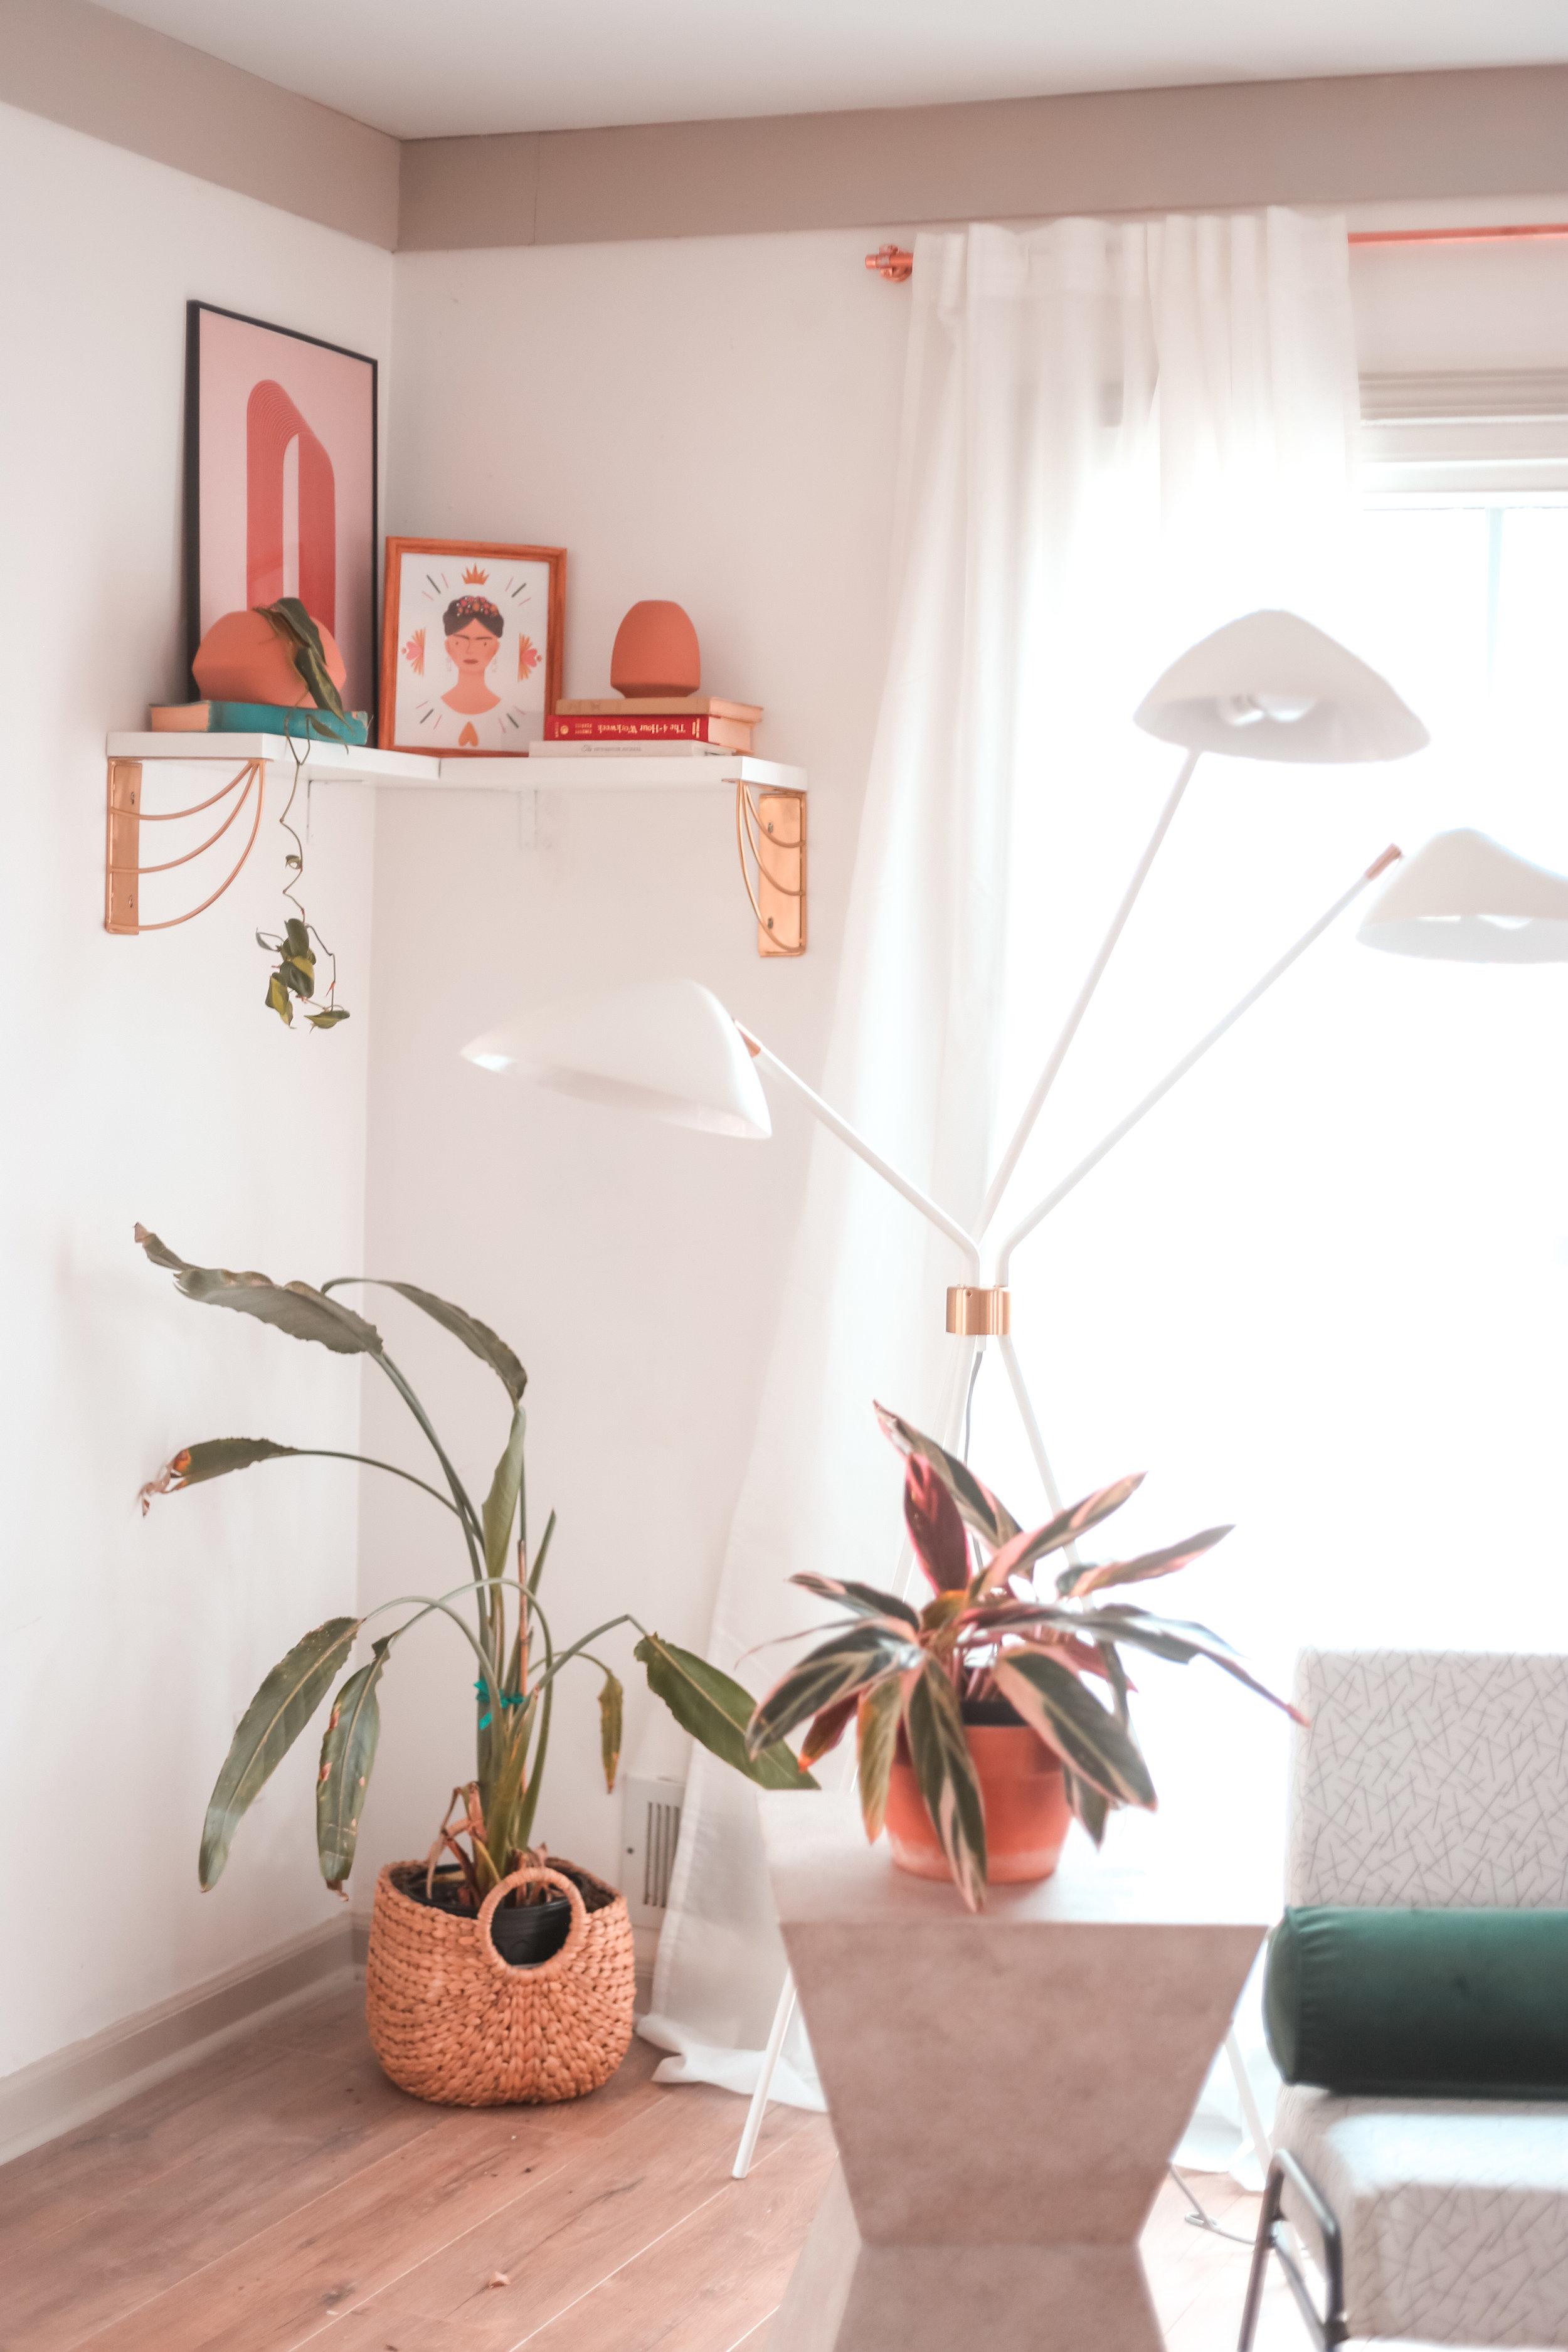 https://www.houseonasugarhill.com/blog/how-to-install-a-corner-wall-shelf